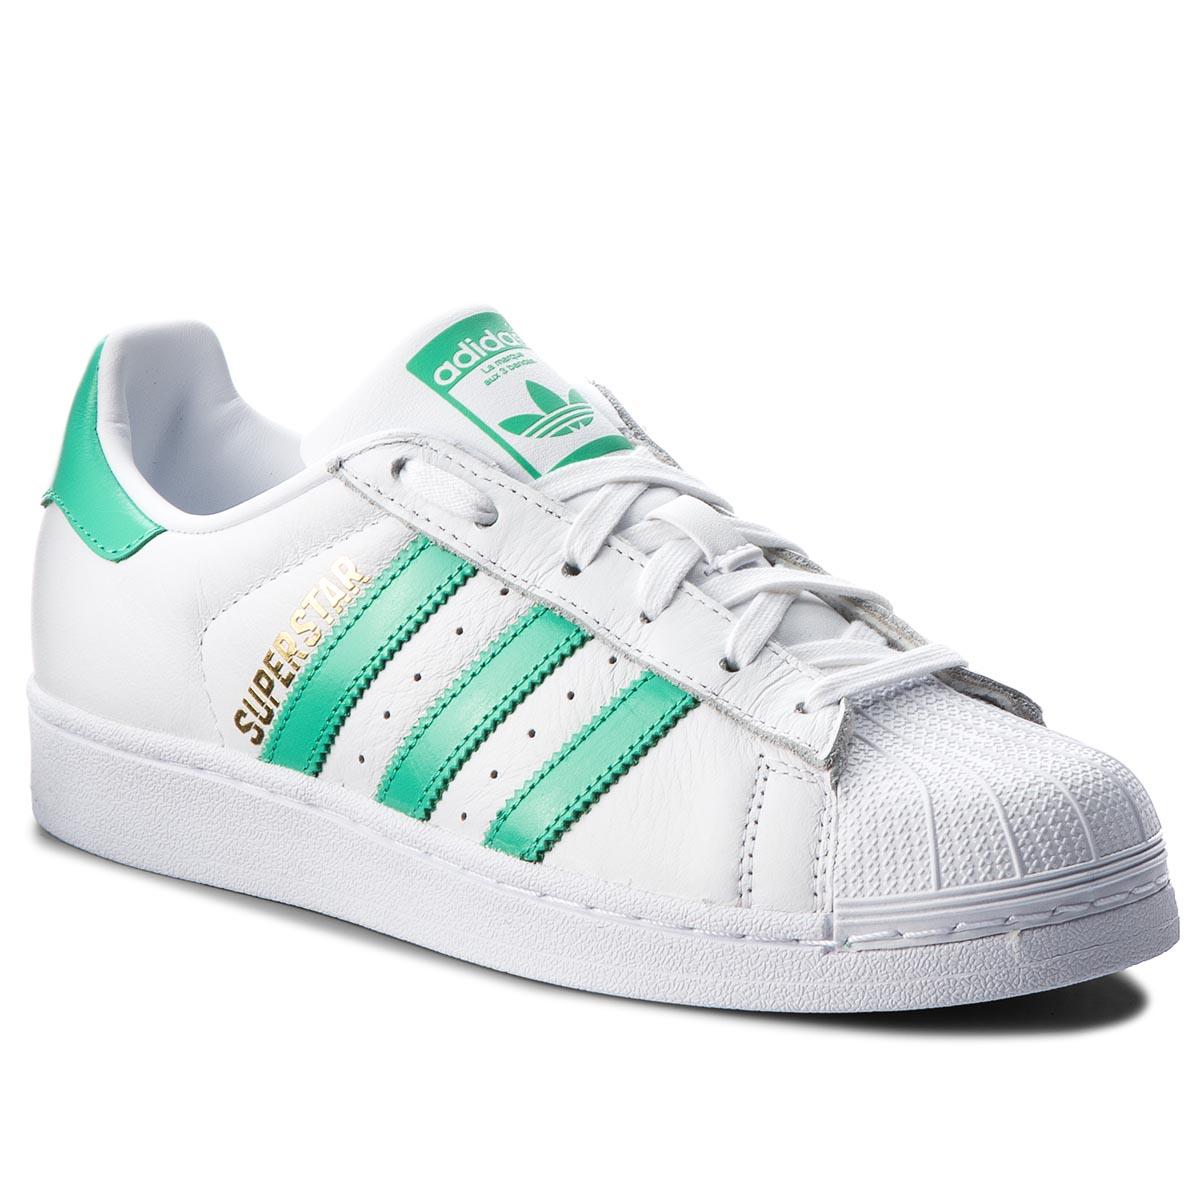 a96025639f Cipő adidas - Superstar B41995 Ftwwht/Hiregr/Goldmt - Glami.hu